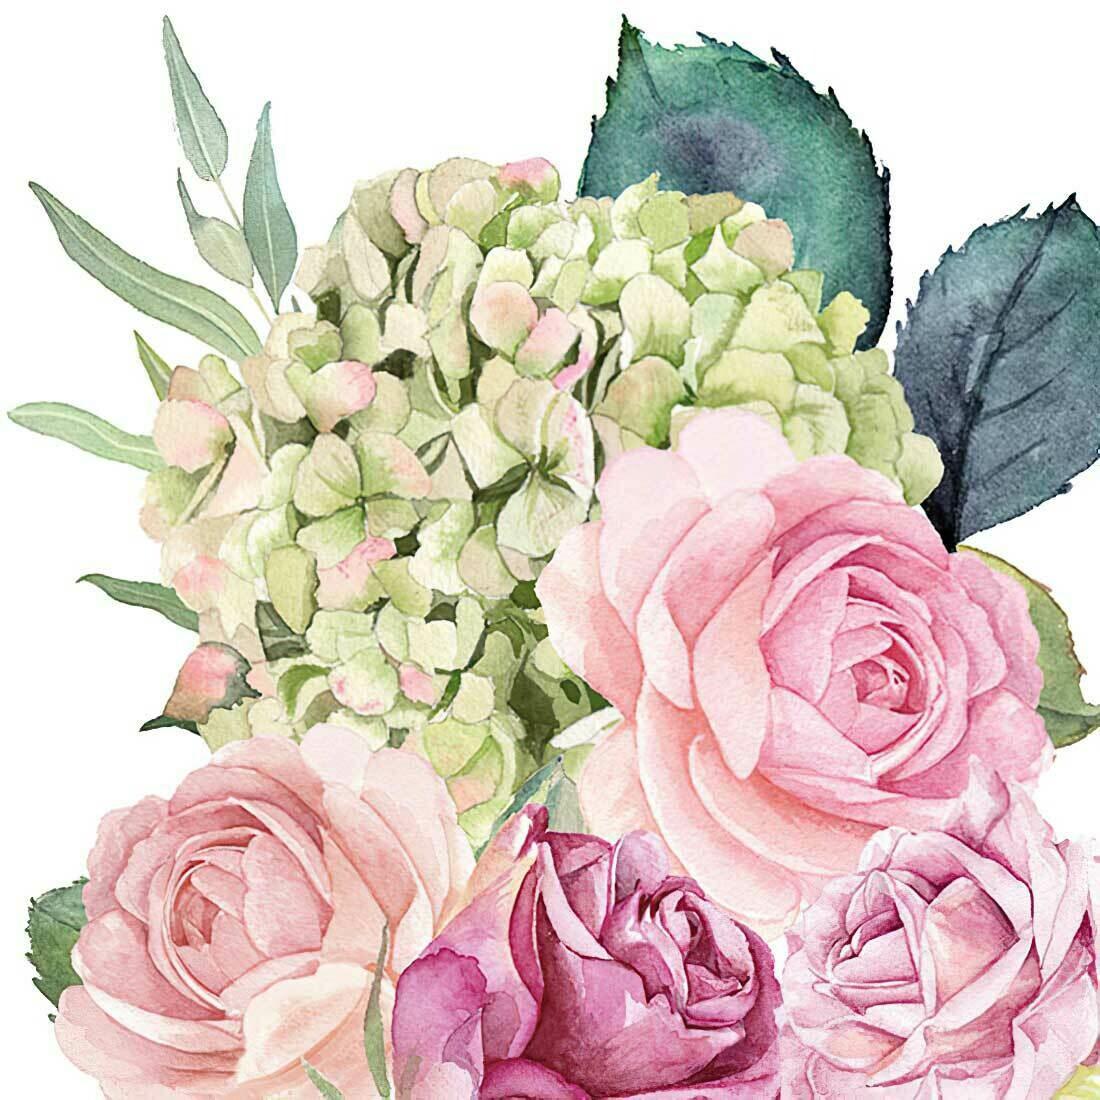 Decoupage Paper Napkins - Floral - Rose Garden (1 Sheet)